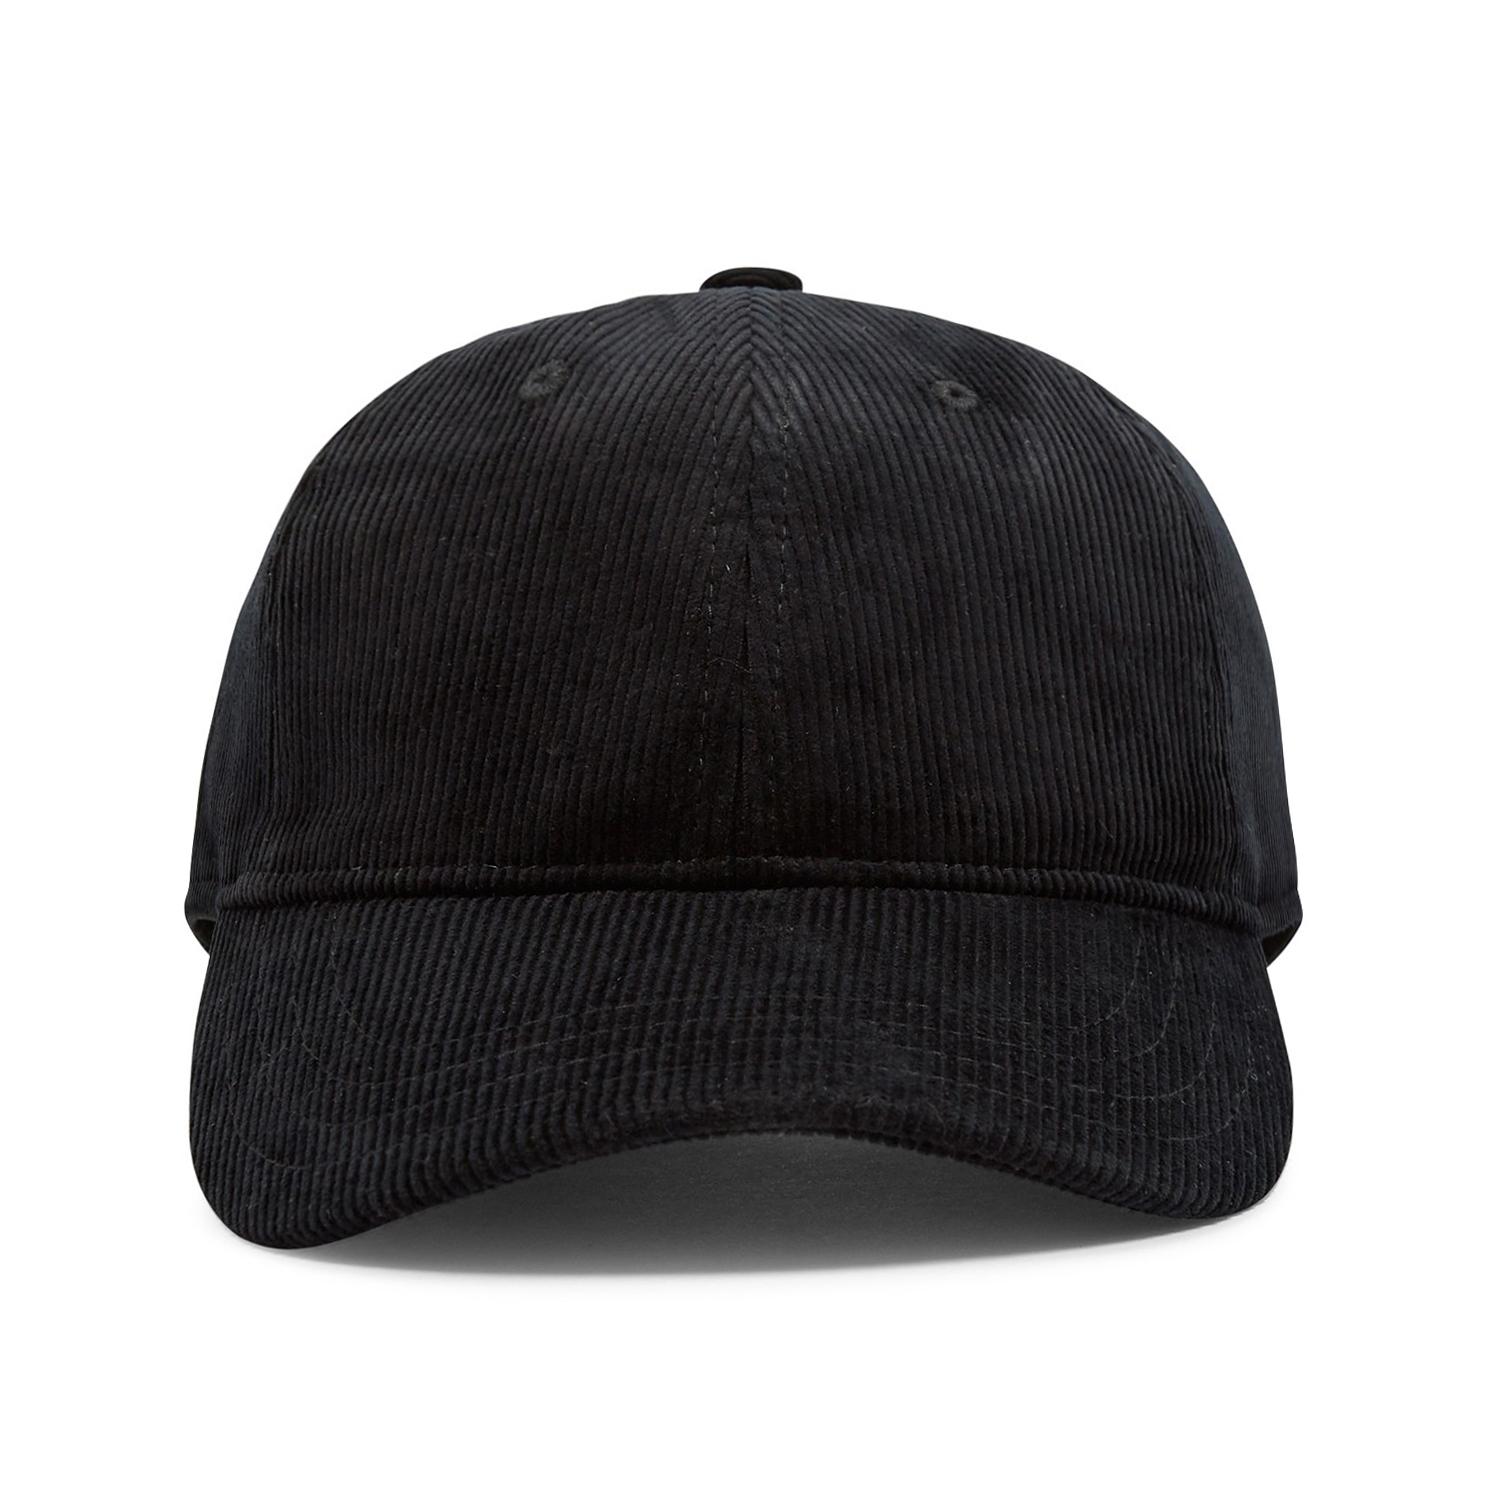 4544e8ebf79 Carhartt Cappelli Manchester Cap Black White Black